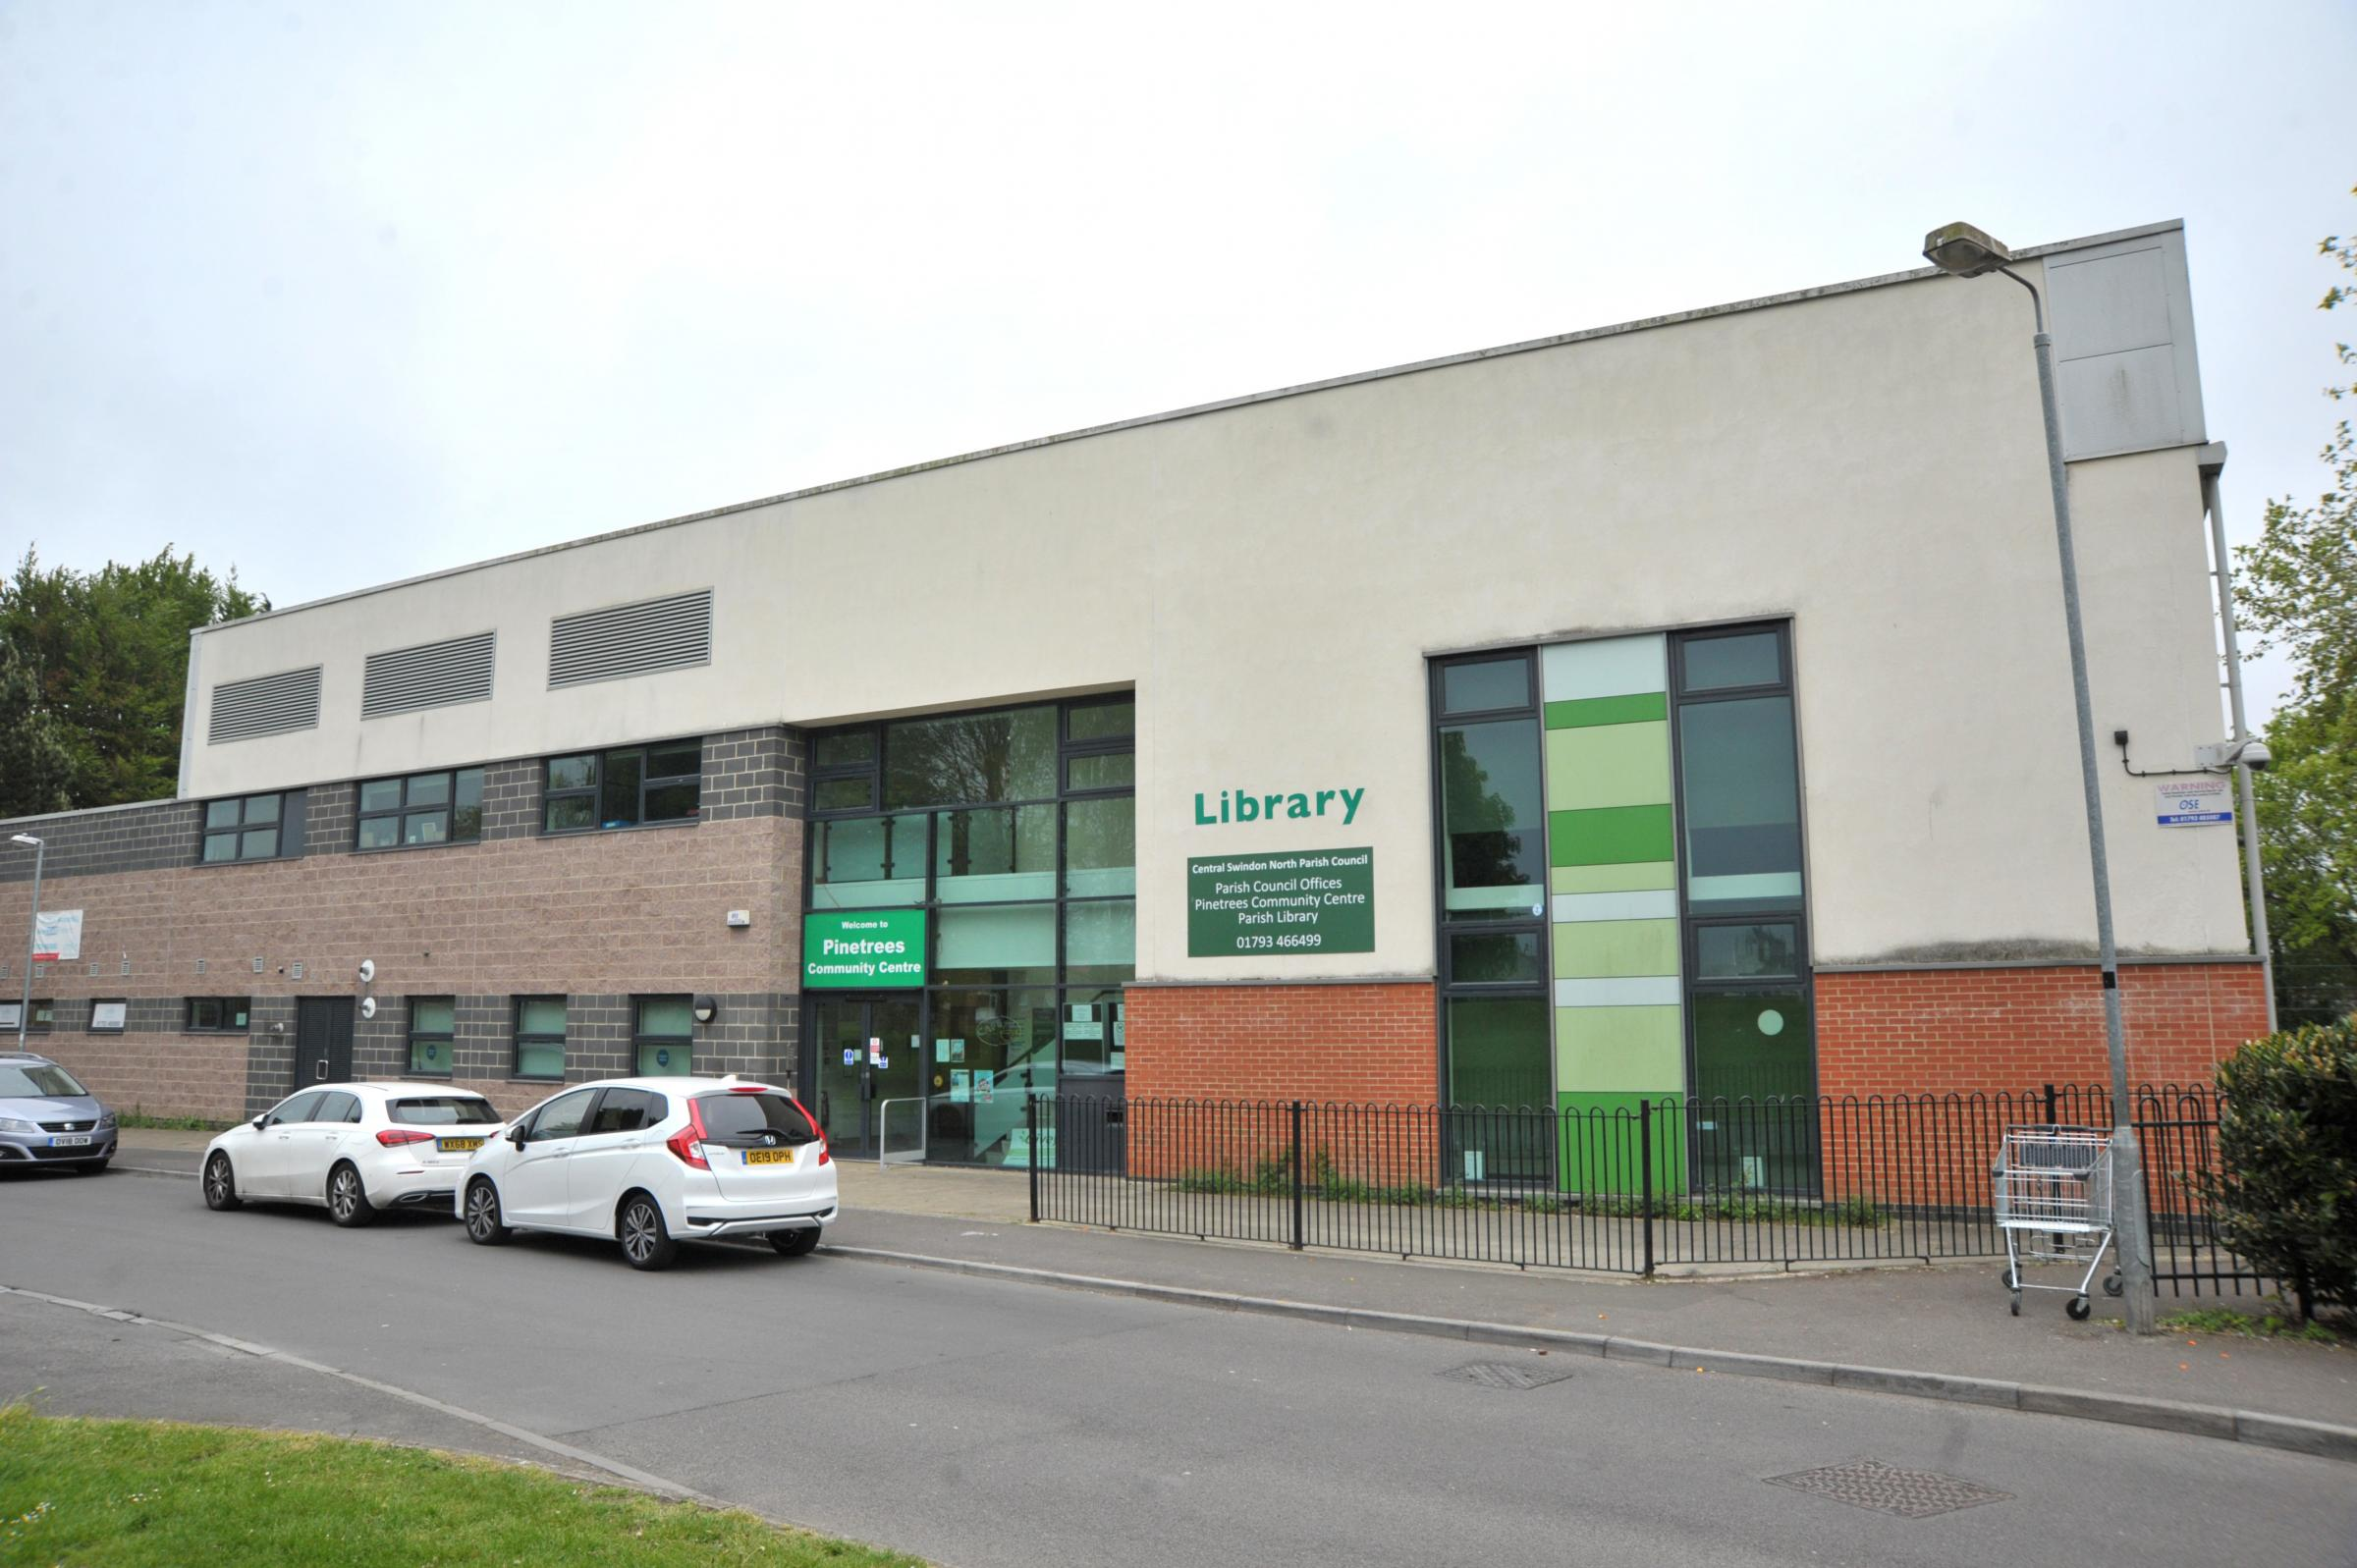 New dementia cafe coming to Pinehurst in Swindon